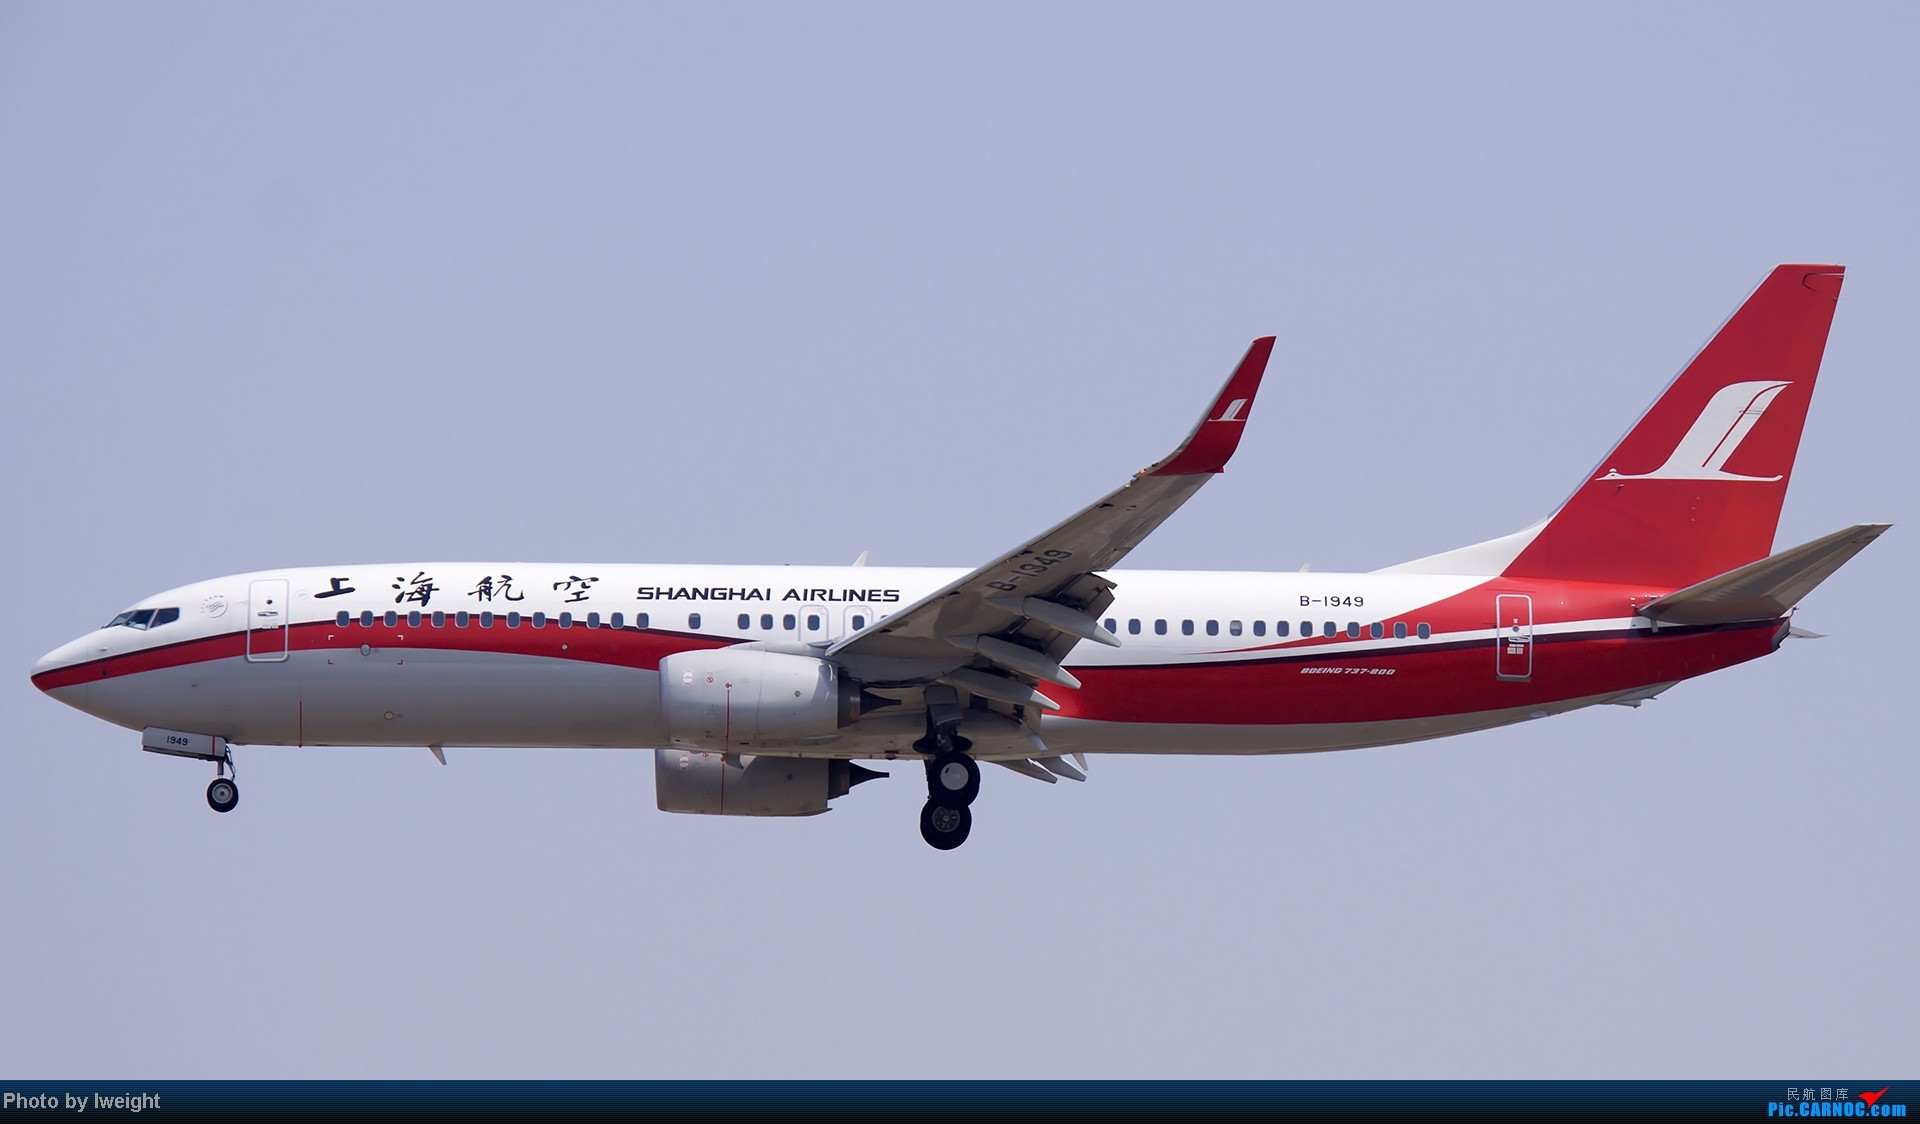 Re:[原创]错过了卡航的巴塞罗那号,只有这些大路货了,泪奔啊 BOEING 737-800 B-1949 中国北京首都机场